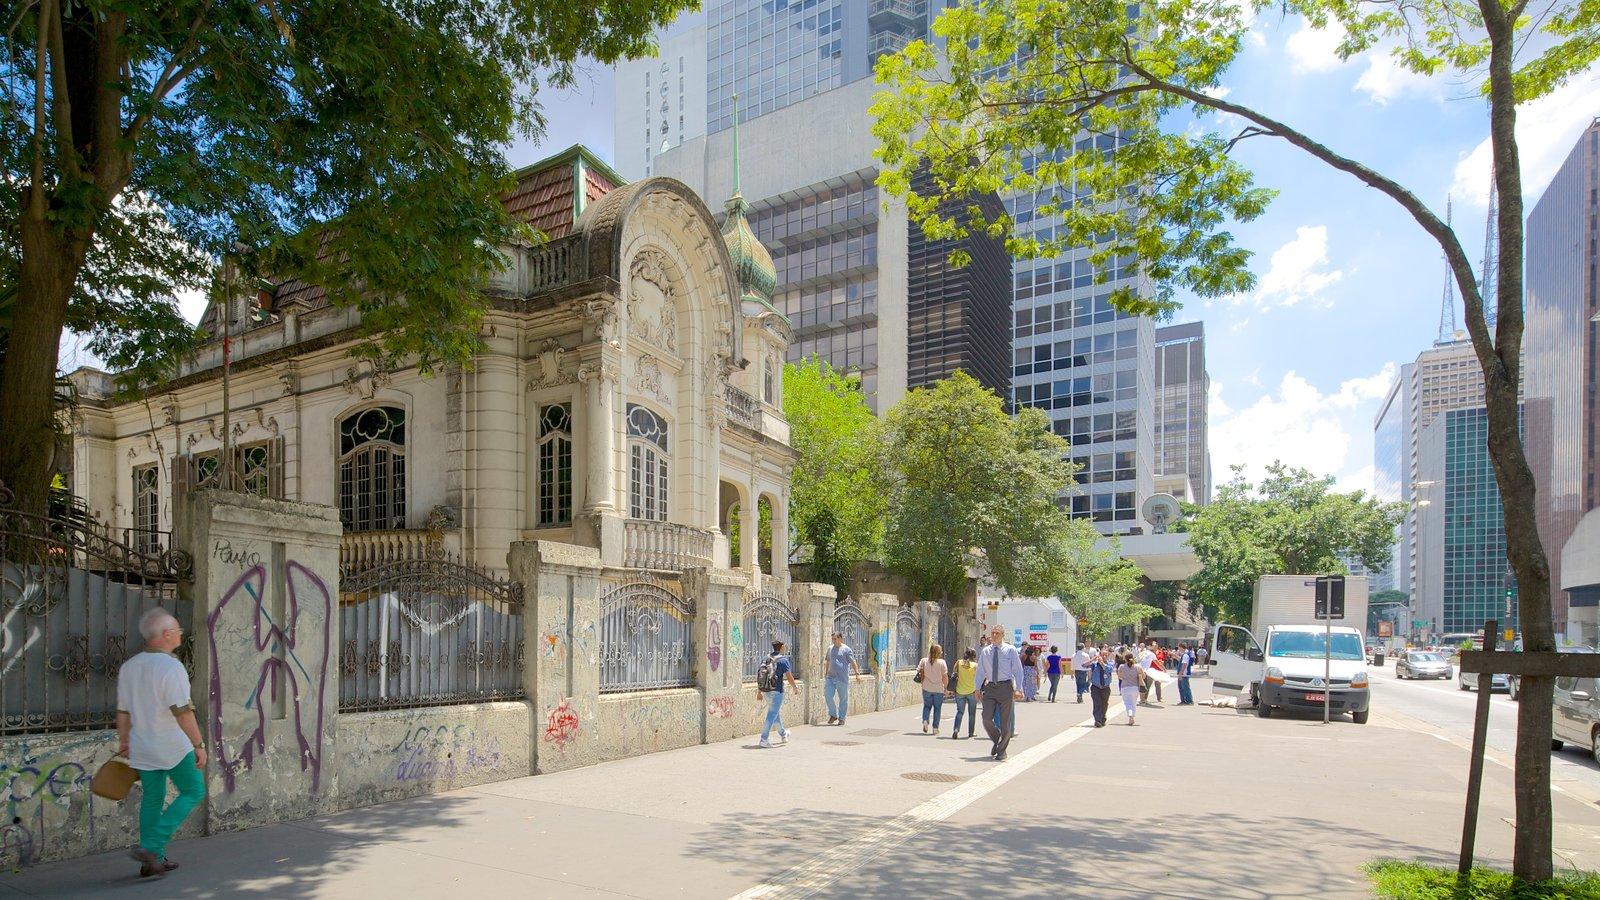 Avenida Paulista caracterizando arquitetura de patrimônio